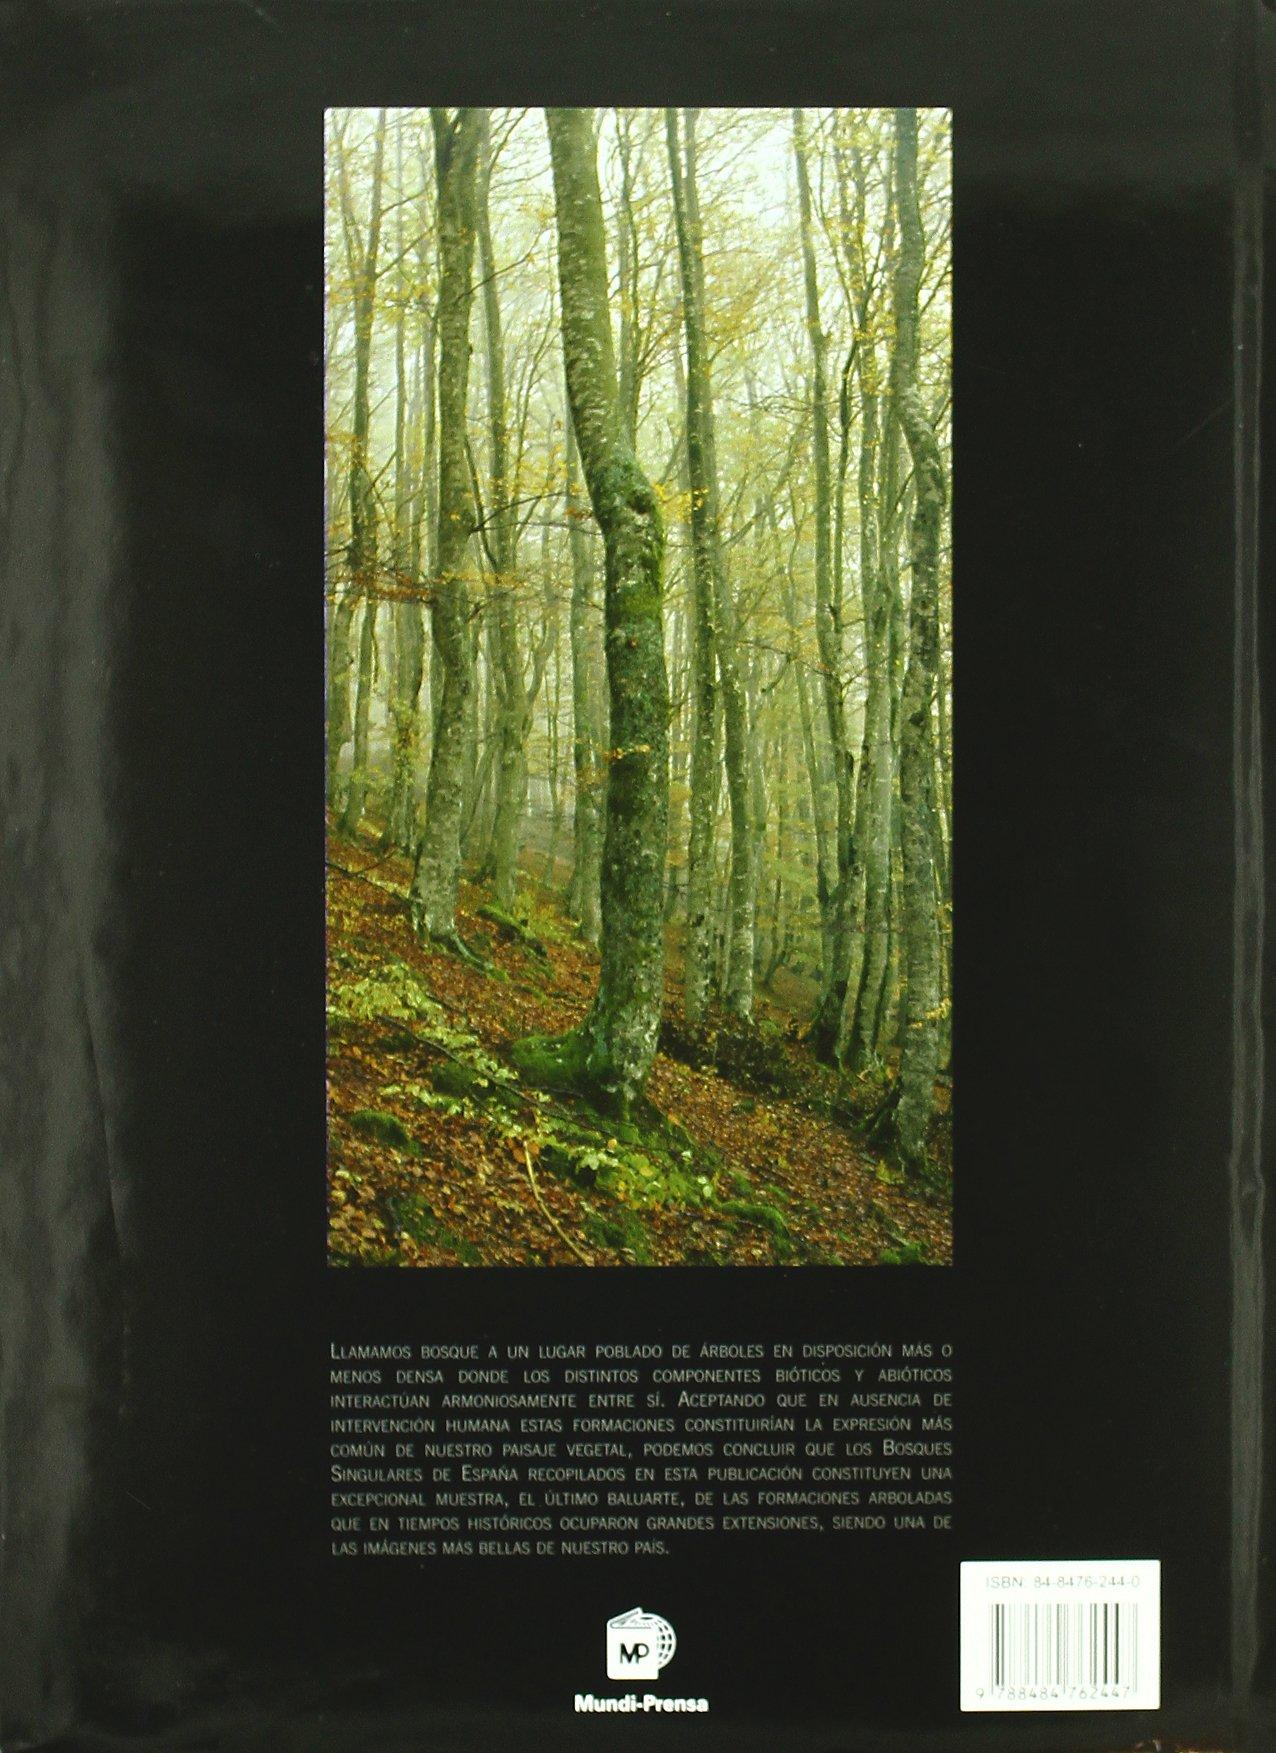 Bosques monumentales de España: Amazon.es: Mundi-Prensa: Libros